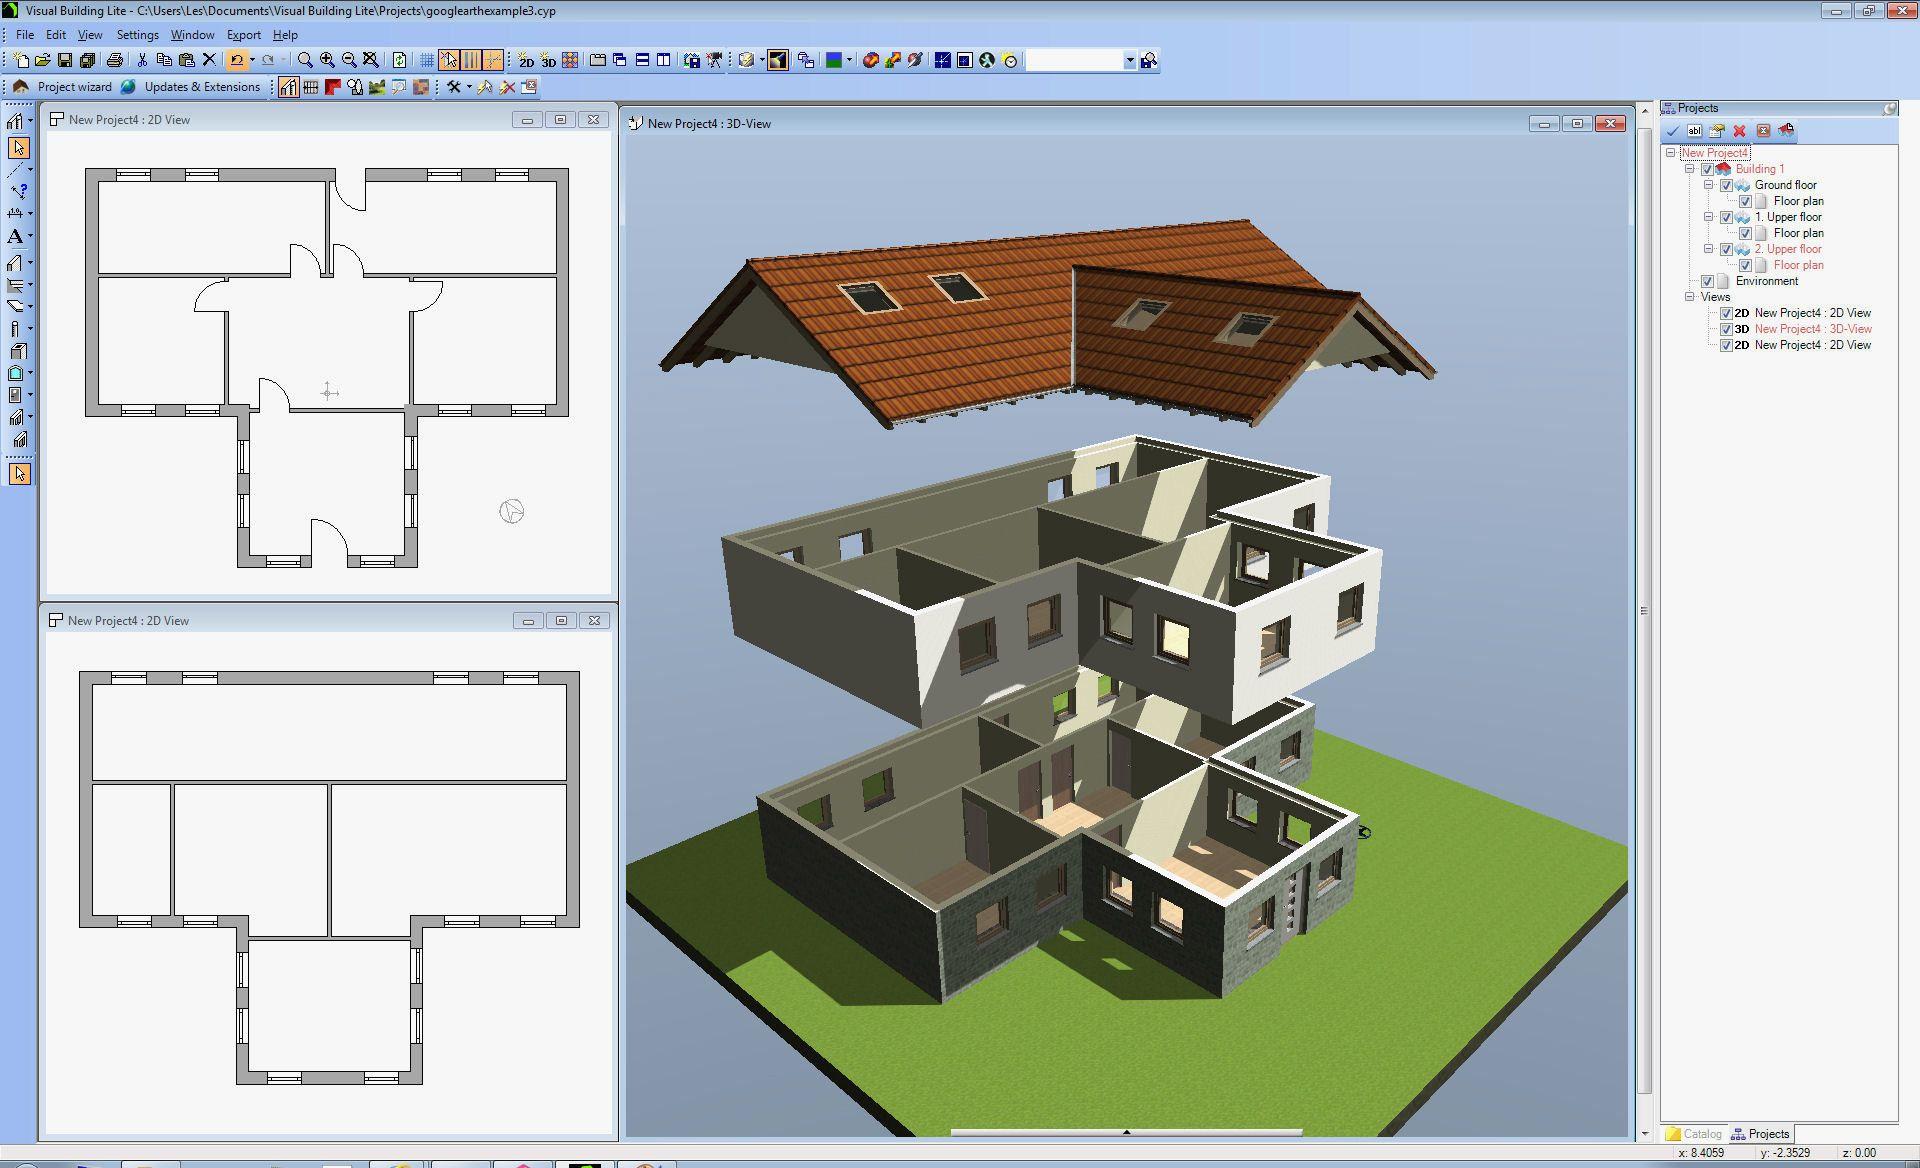 Free Floor Plan Software For Windows 7 Lovely Best Free Floor Plan Software With Free Floor Pl Home Design Software Free Home Design Software Floor Plan Design